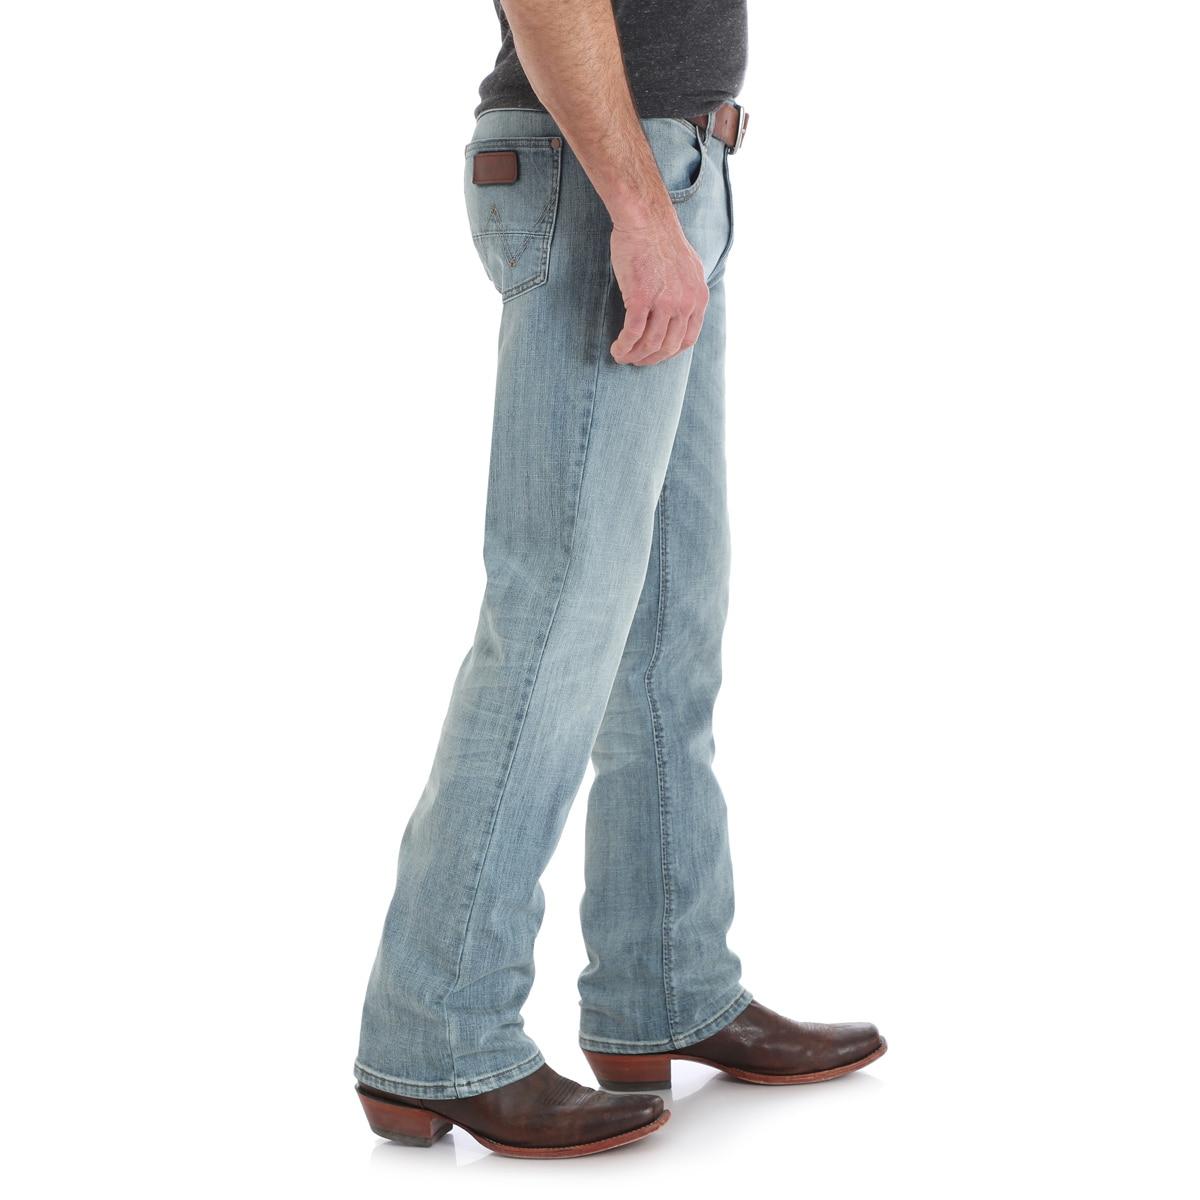 759ca119 Wrangler Men's Retro® Slim Fit Bootcut Jeans - BR Wash